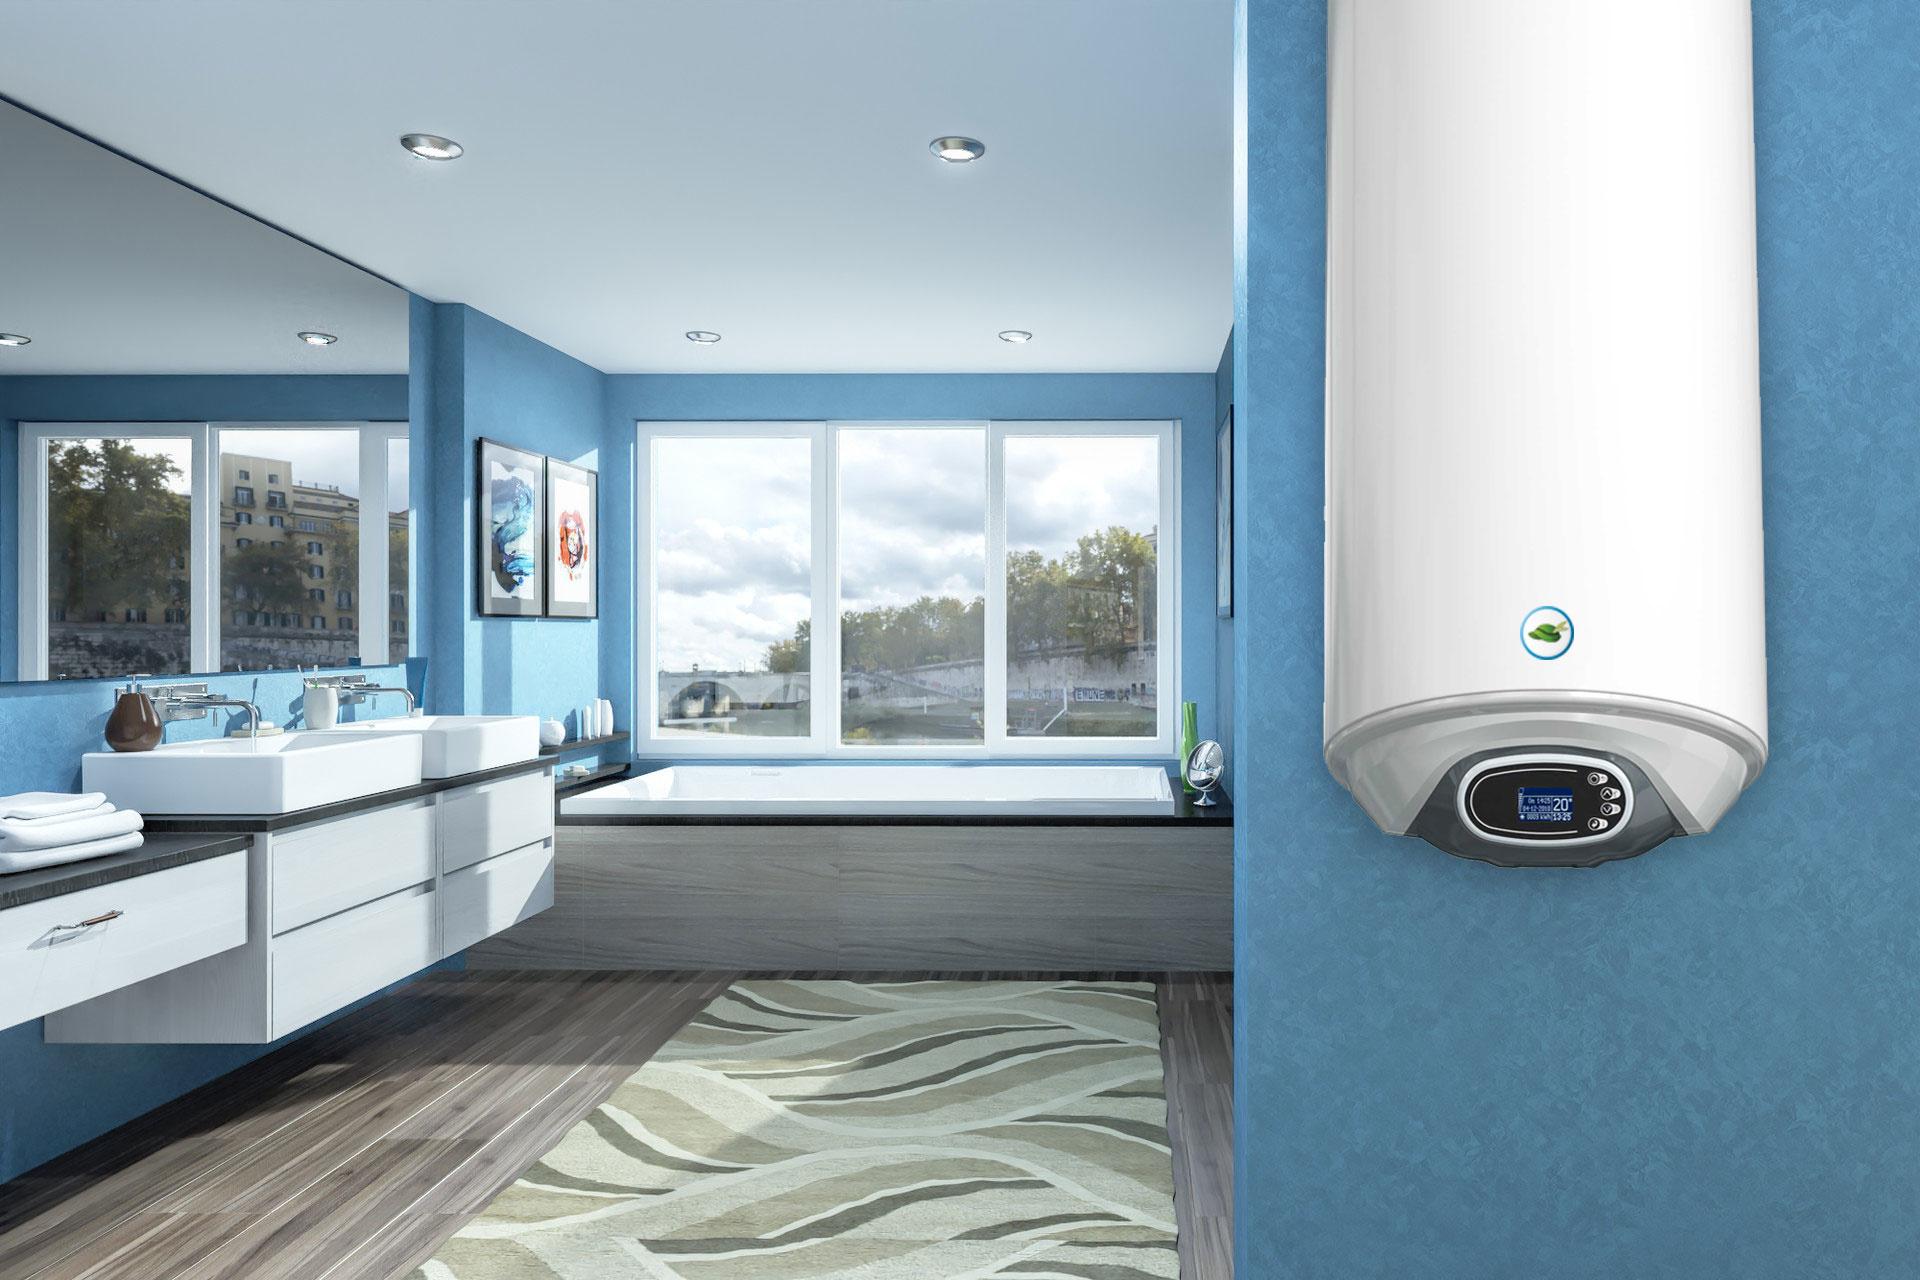 Galanta Green Hat Verticale elektrische boiler 120L, Extra Life, 3kW, met digitale bediening